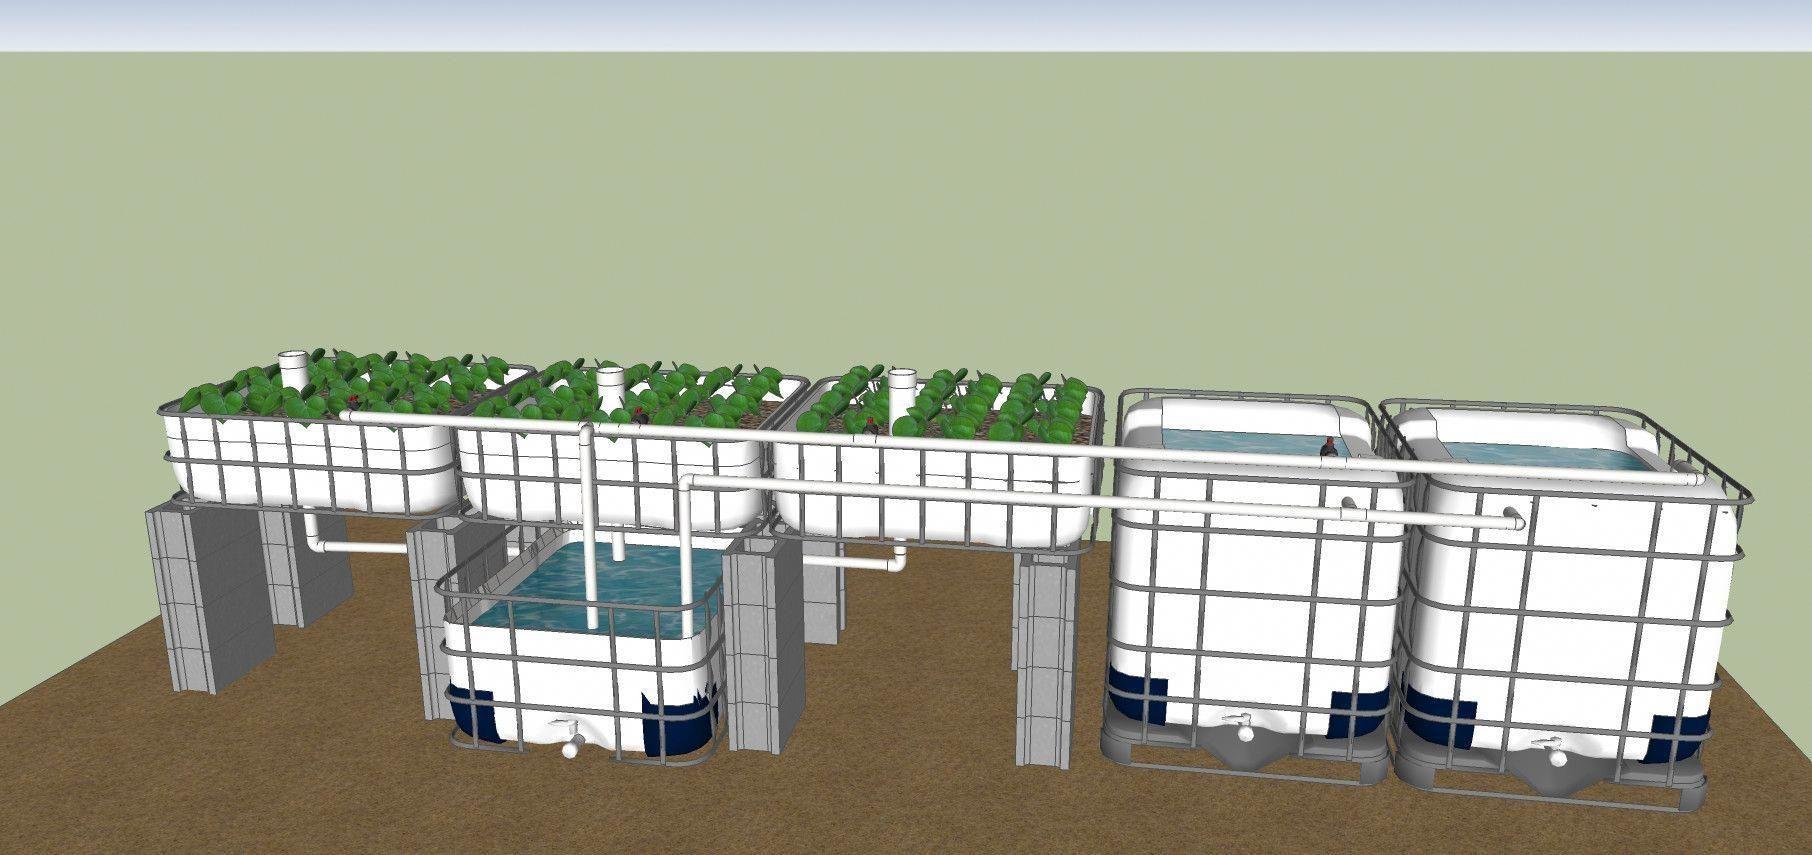 aquaponics Tips to Manage a Great DIY Aquaponics Farm